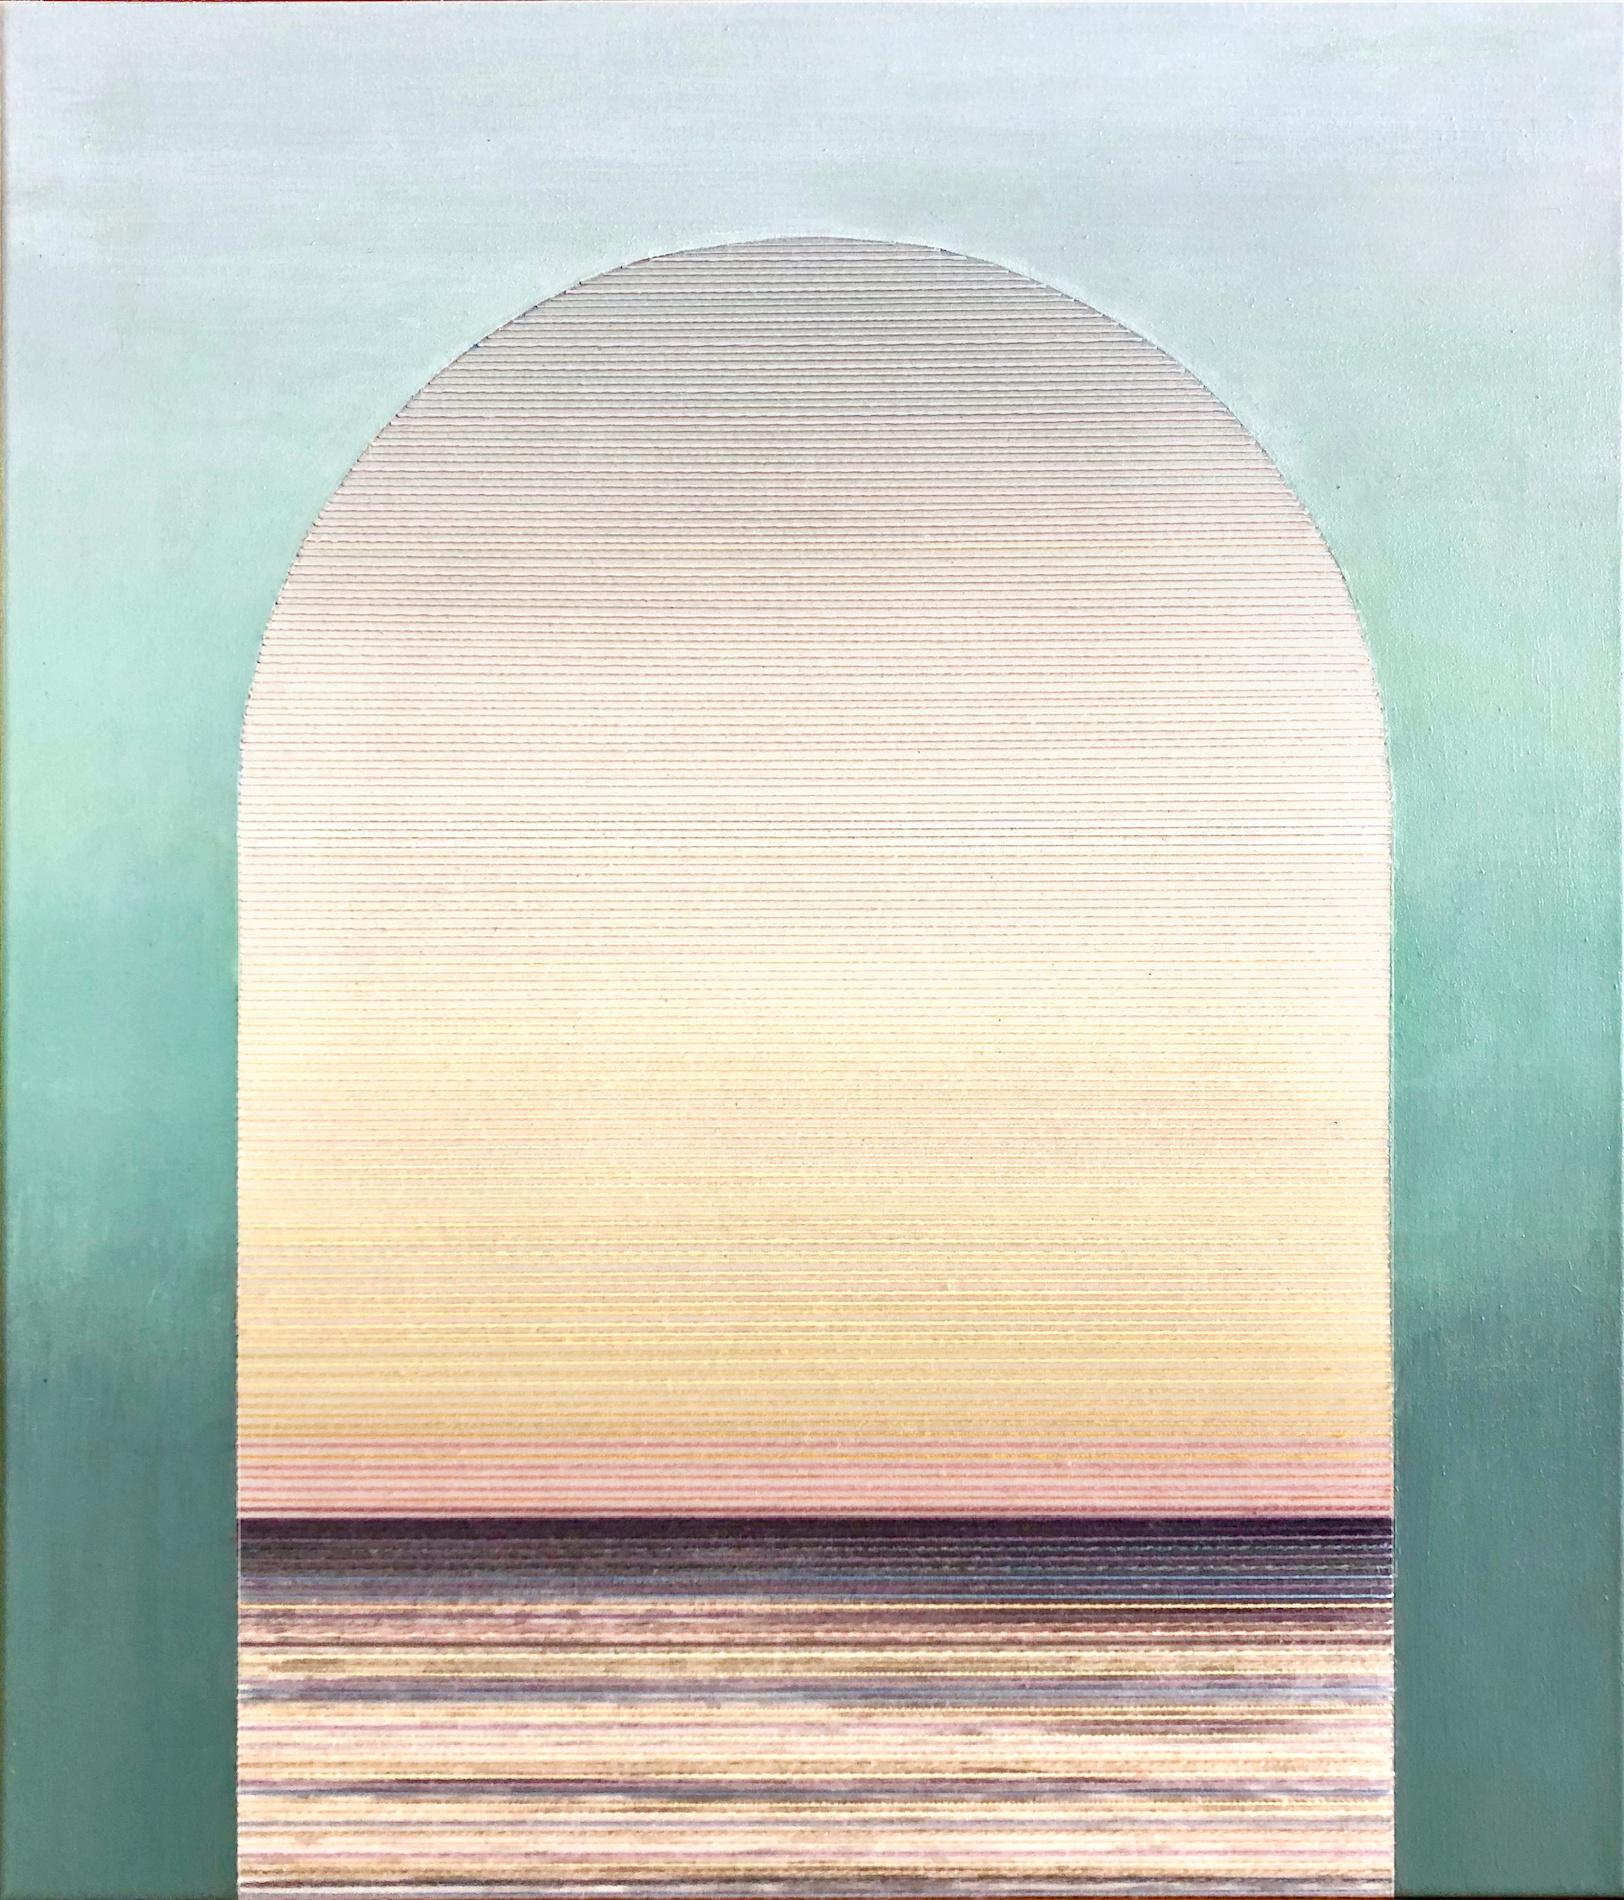 Linda Männel: Jaula d'Oro III, 2019, Tusche/Garn auf Leinwand/Acrylfarbe, 60 x 70 cm,